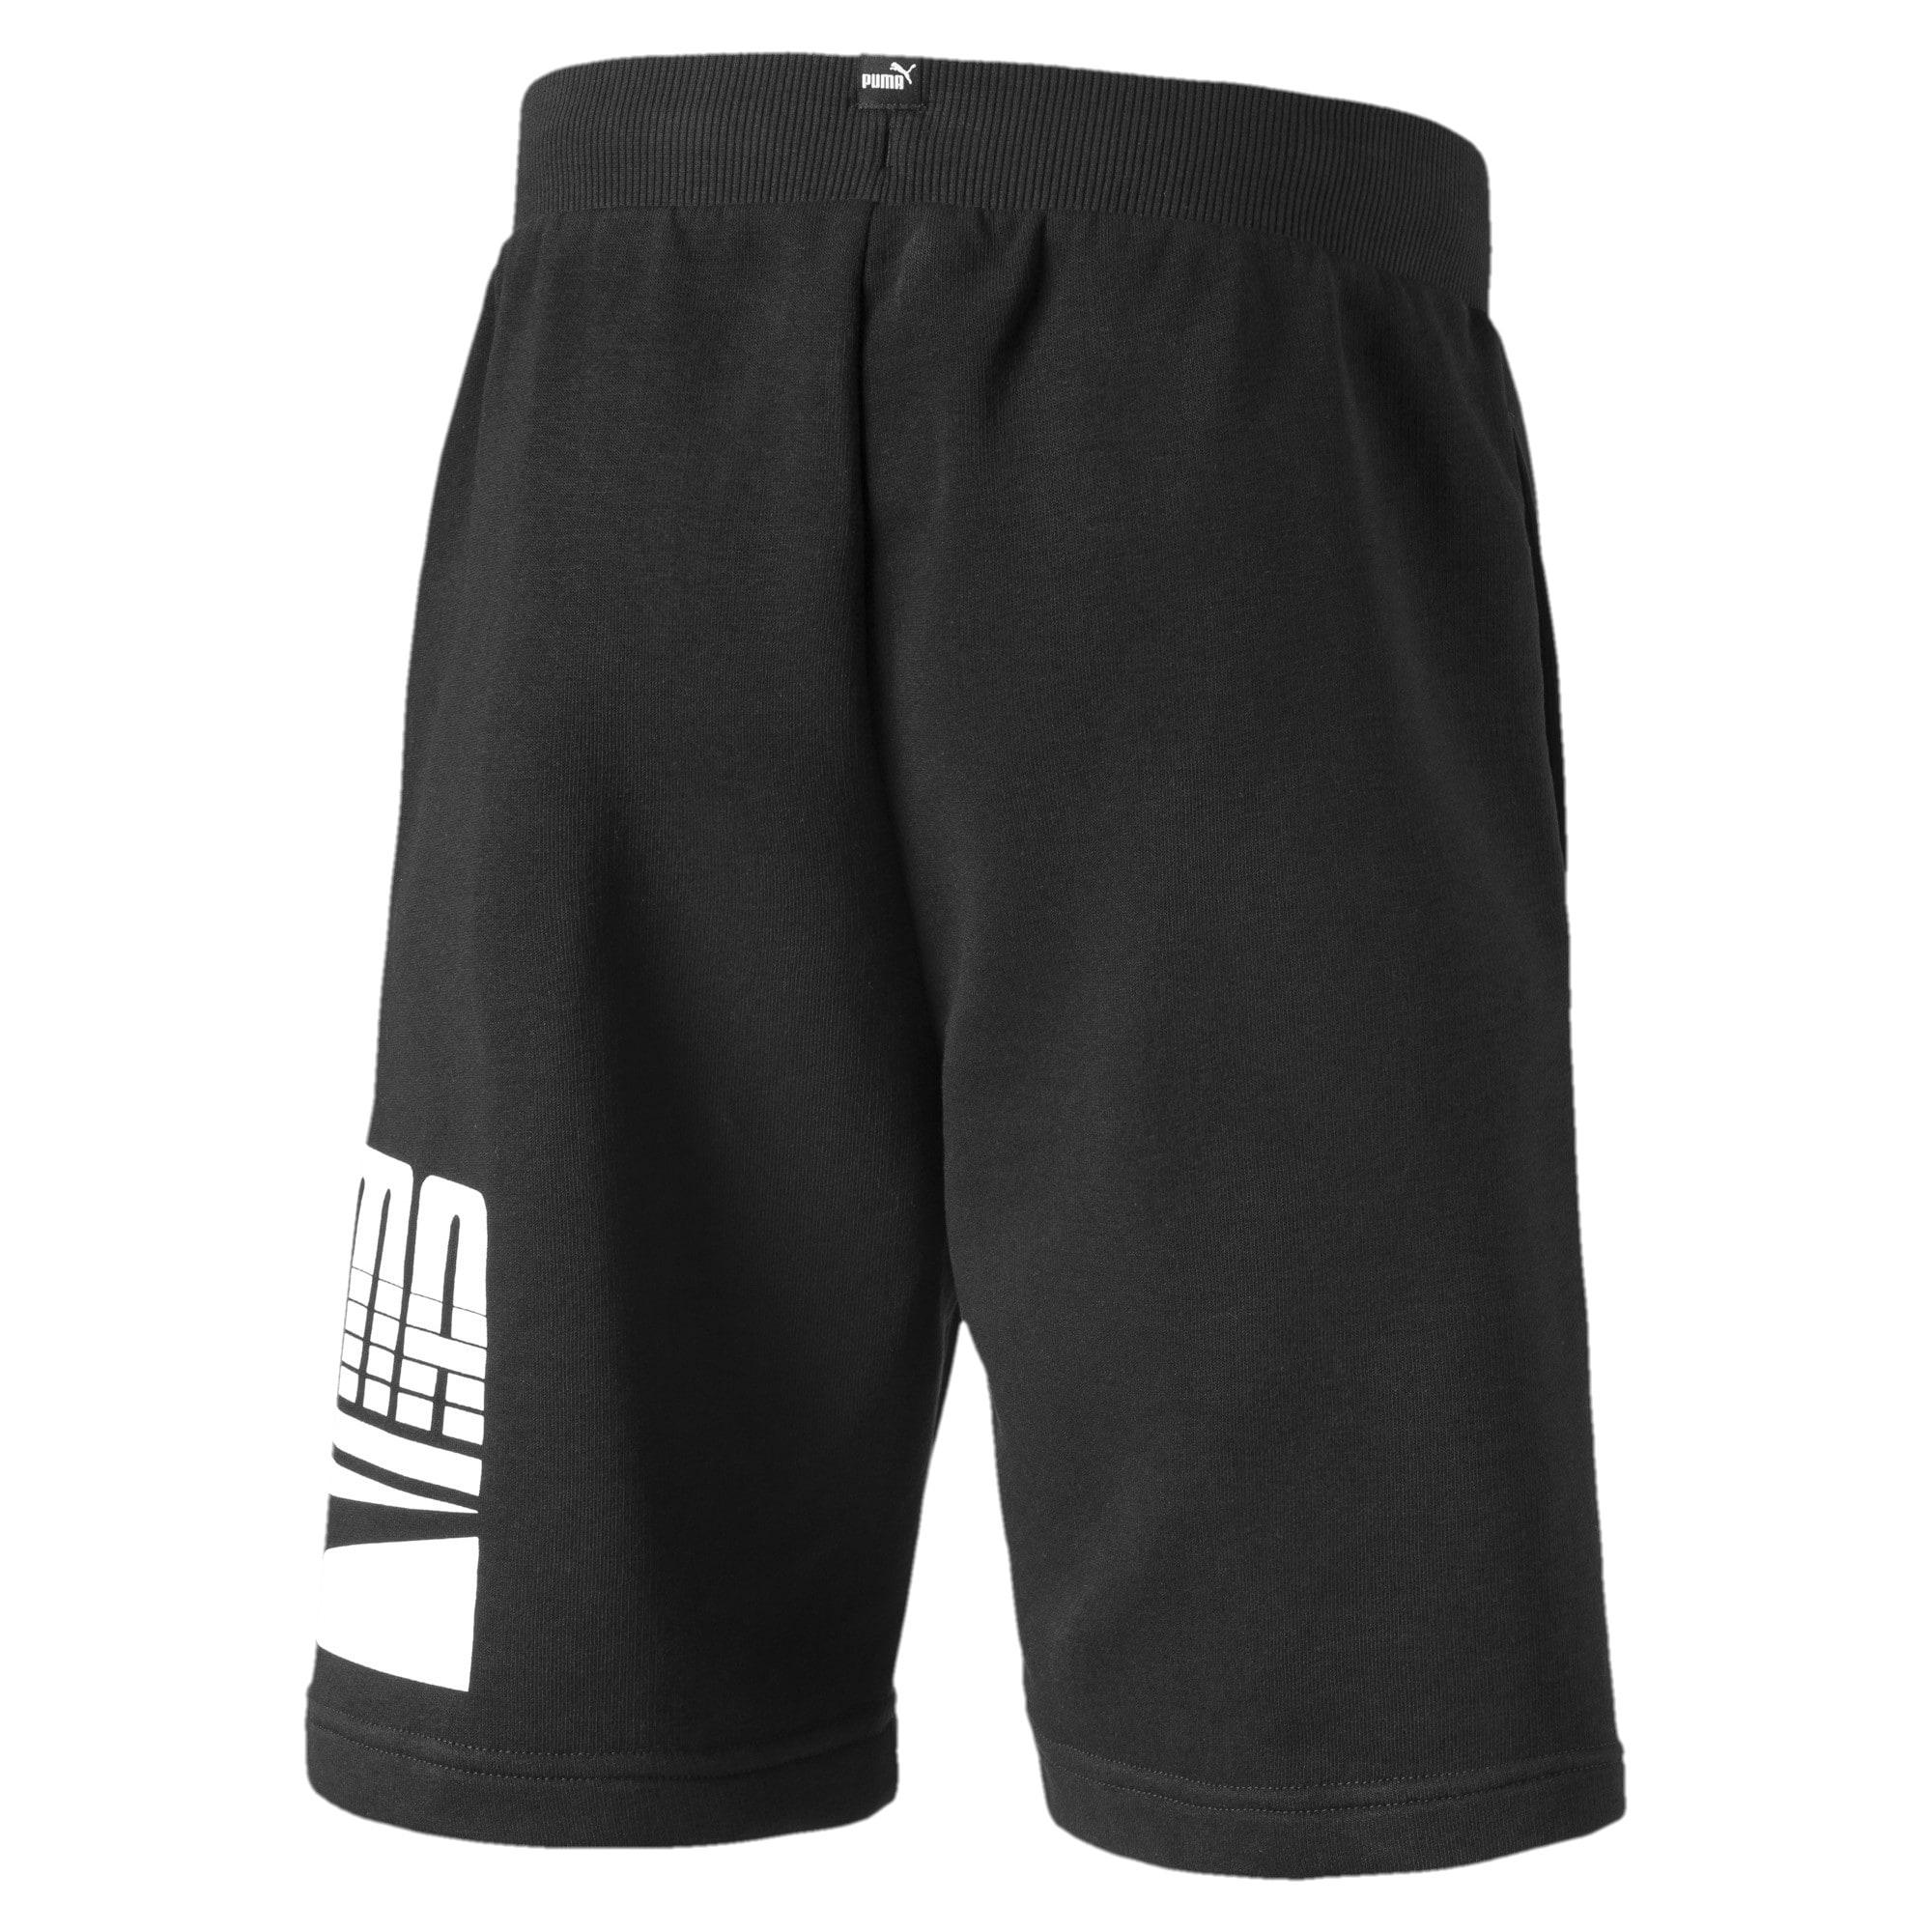 Miniatura 2 de Shorts deportivos Rebel JR, Puma Black, mediano